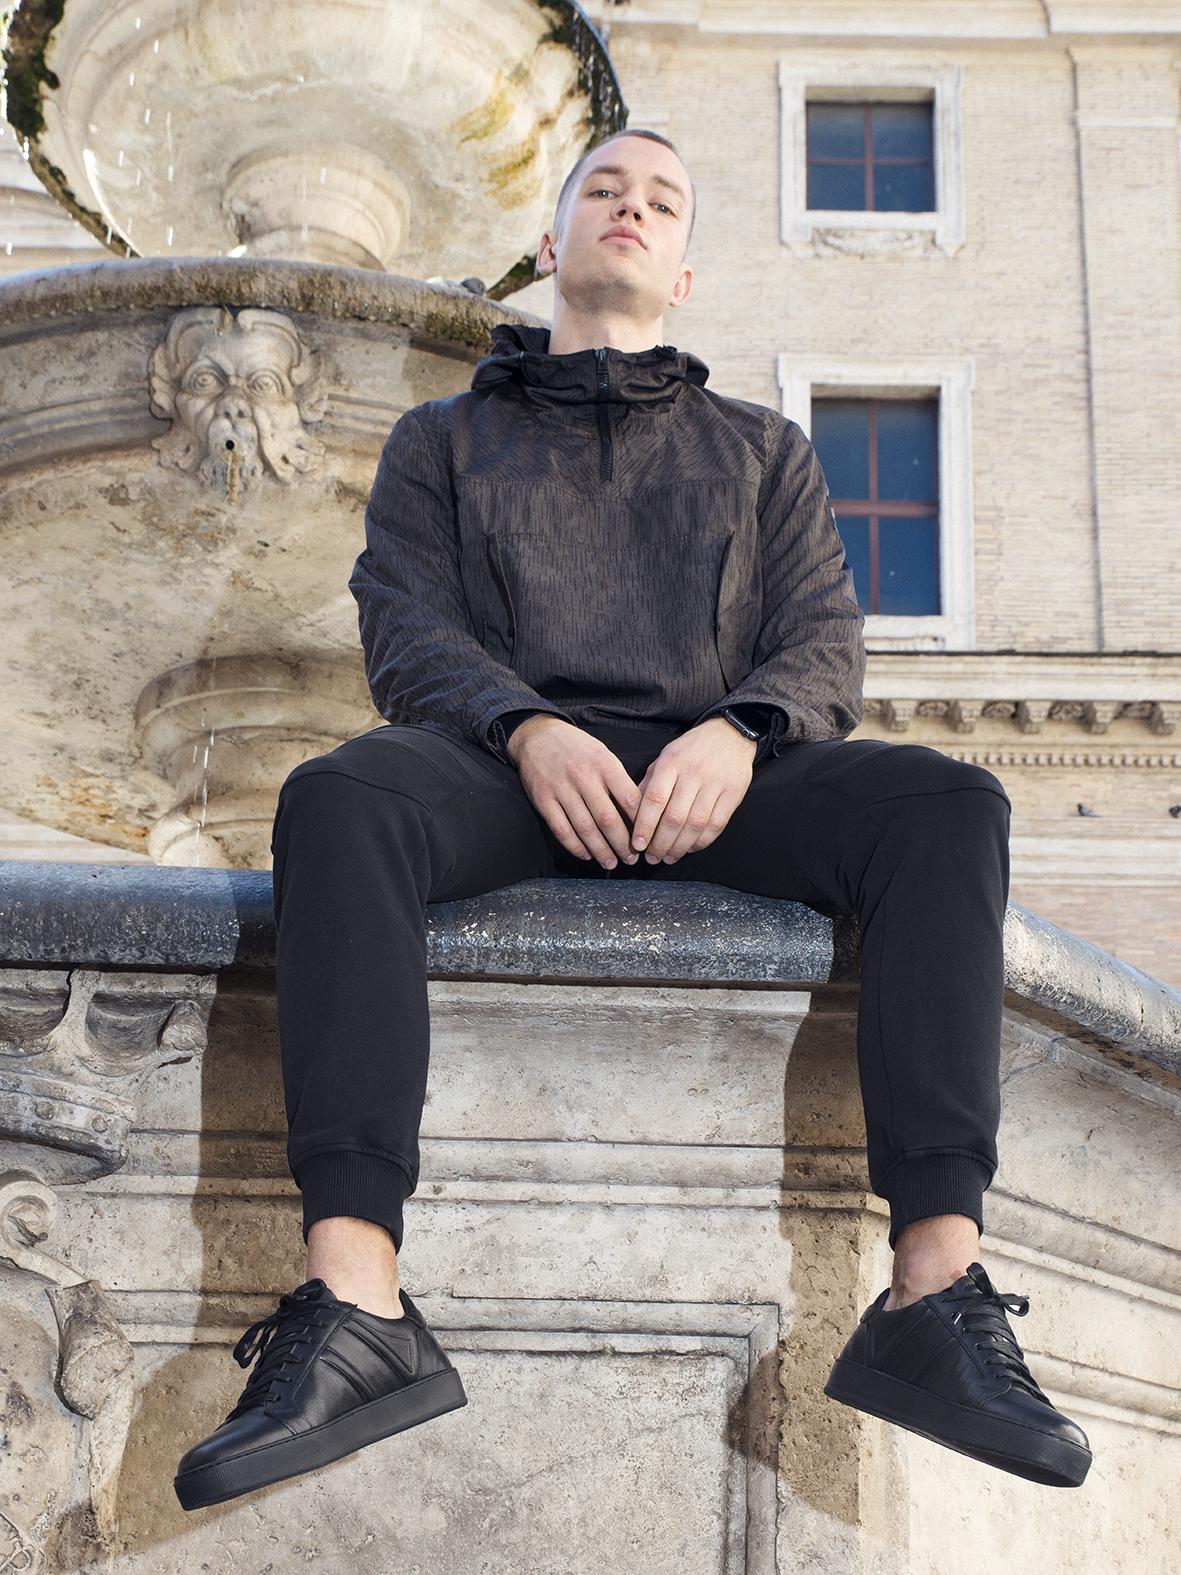 Urban Balck Sneakers Model